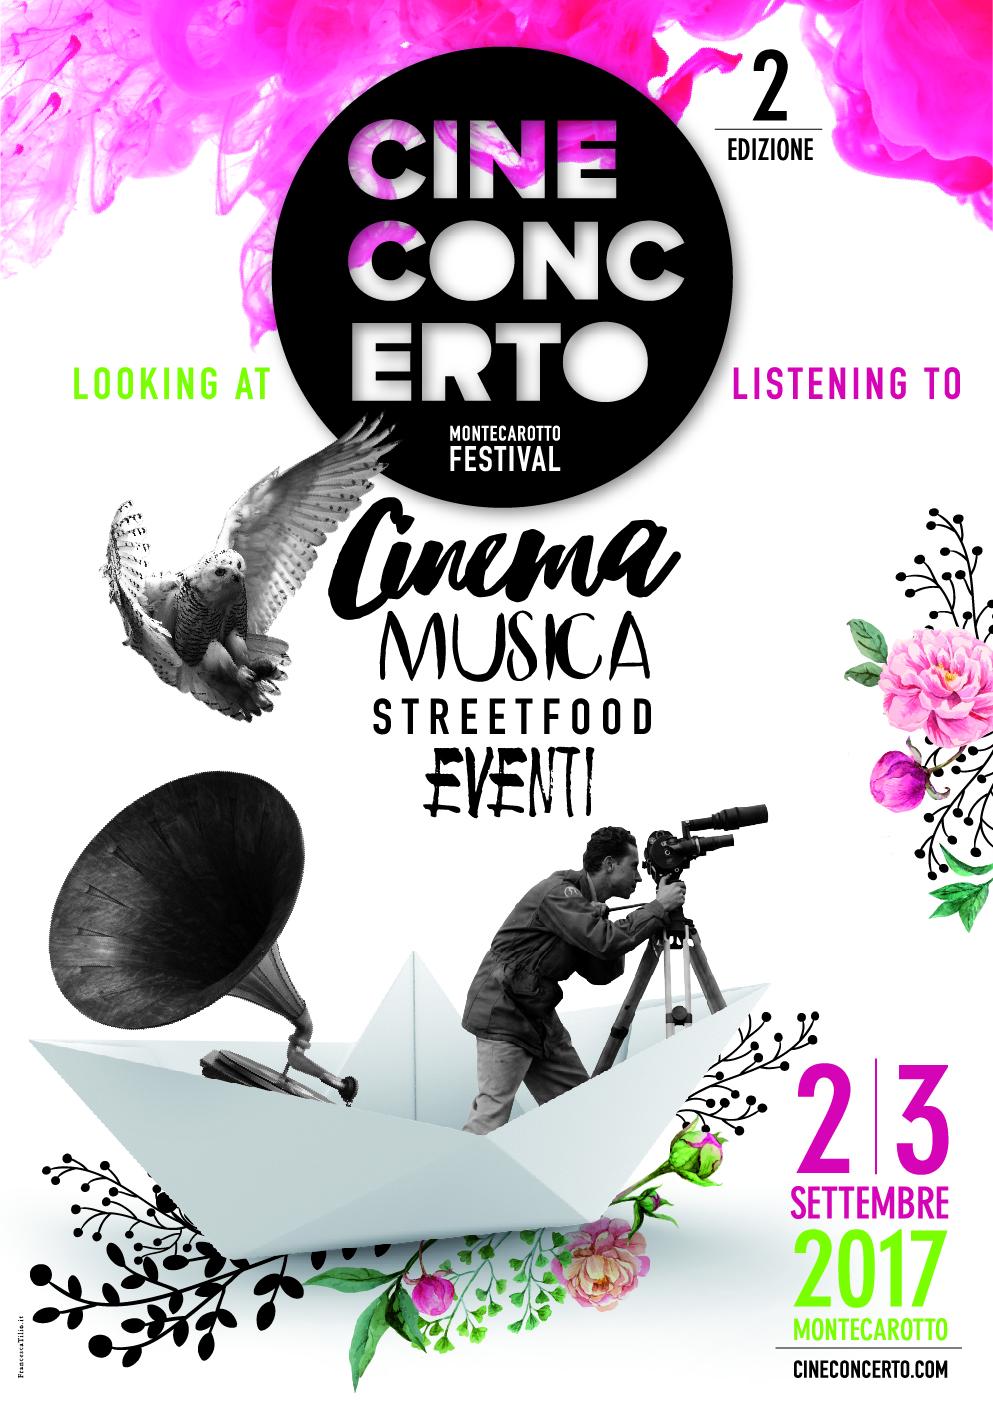 CINECONCERTO FESTIVAL 2017